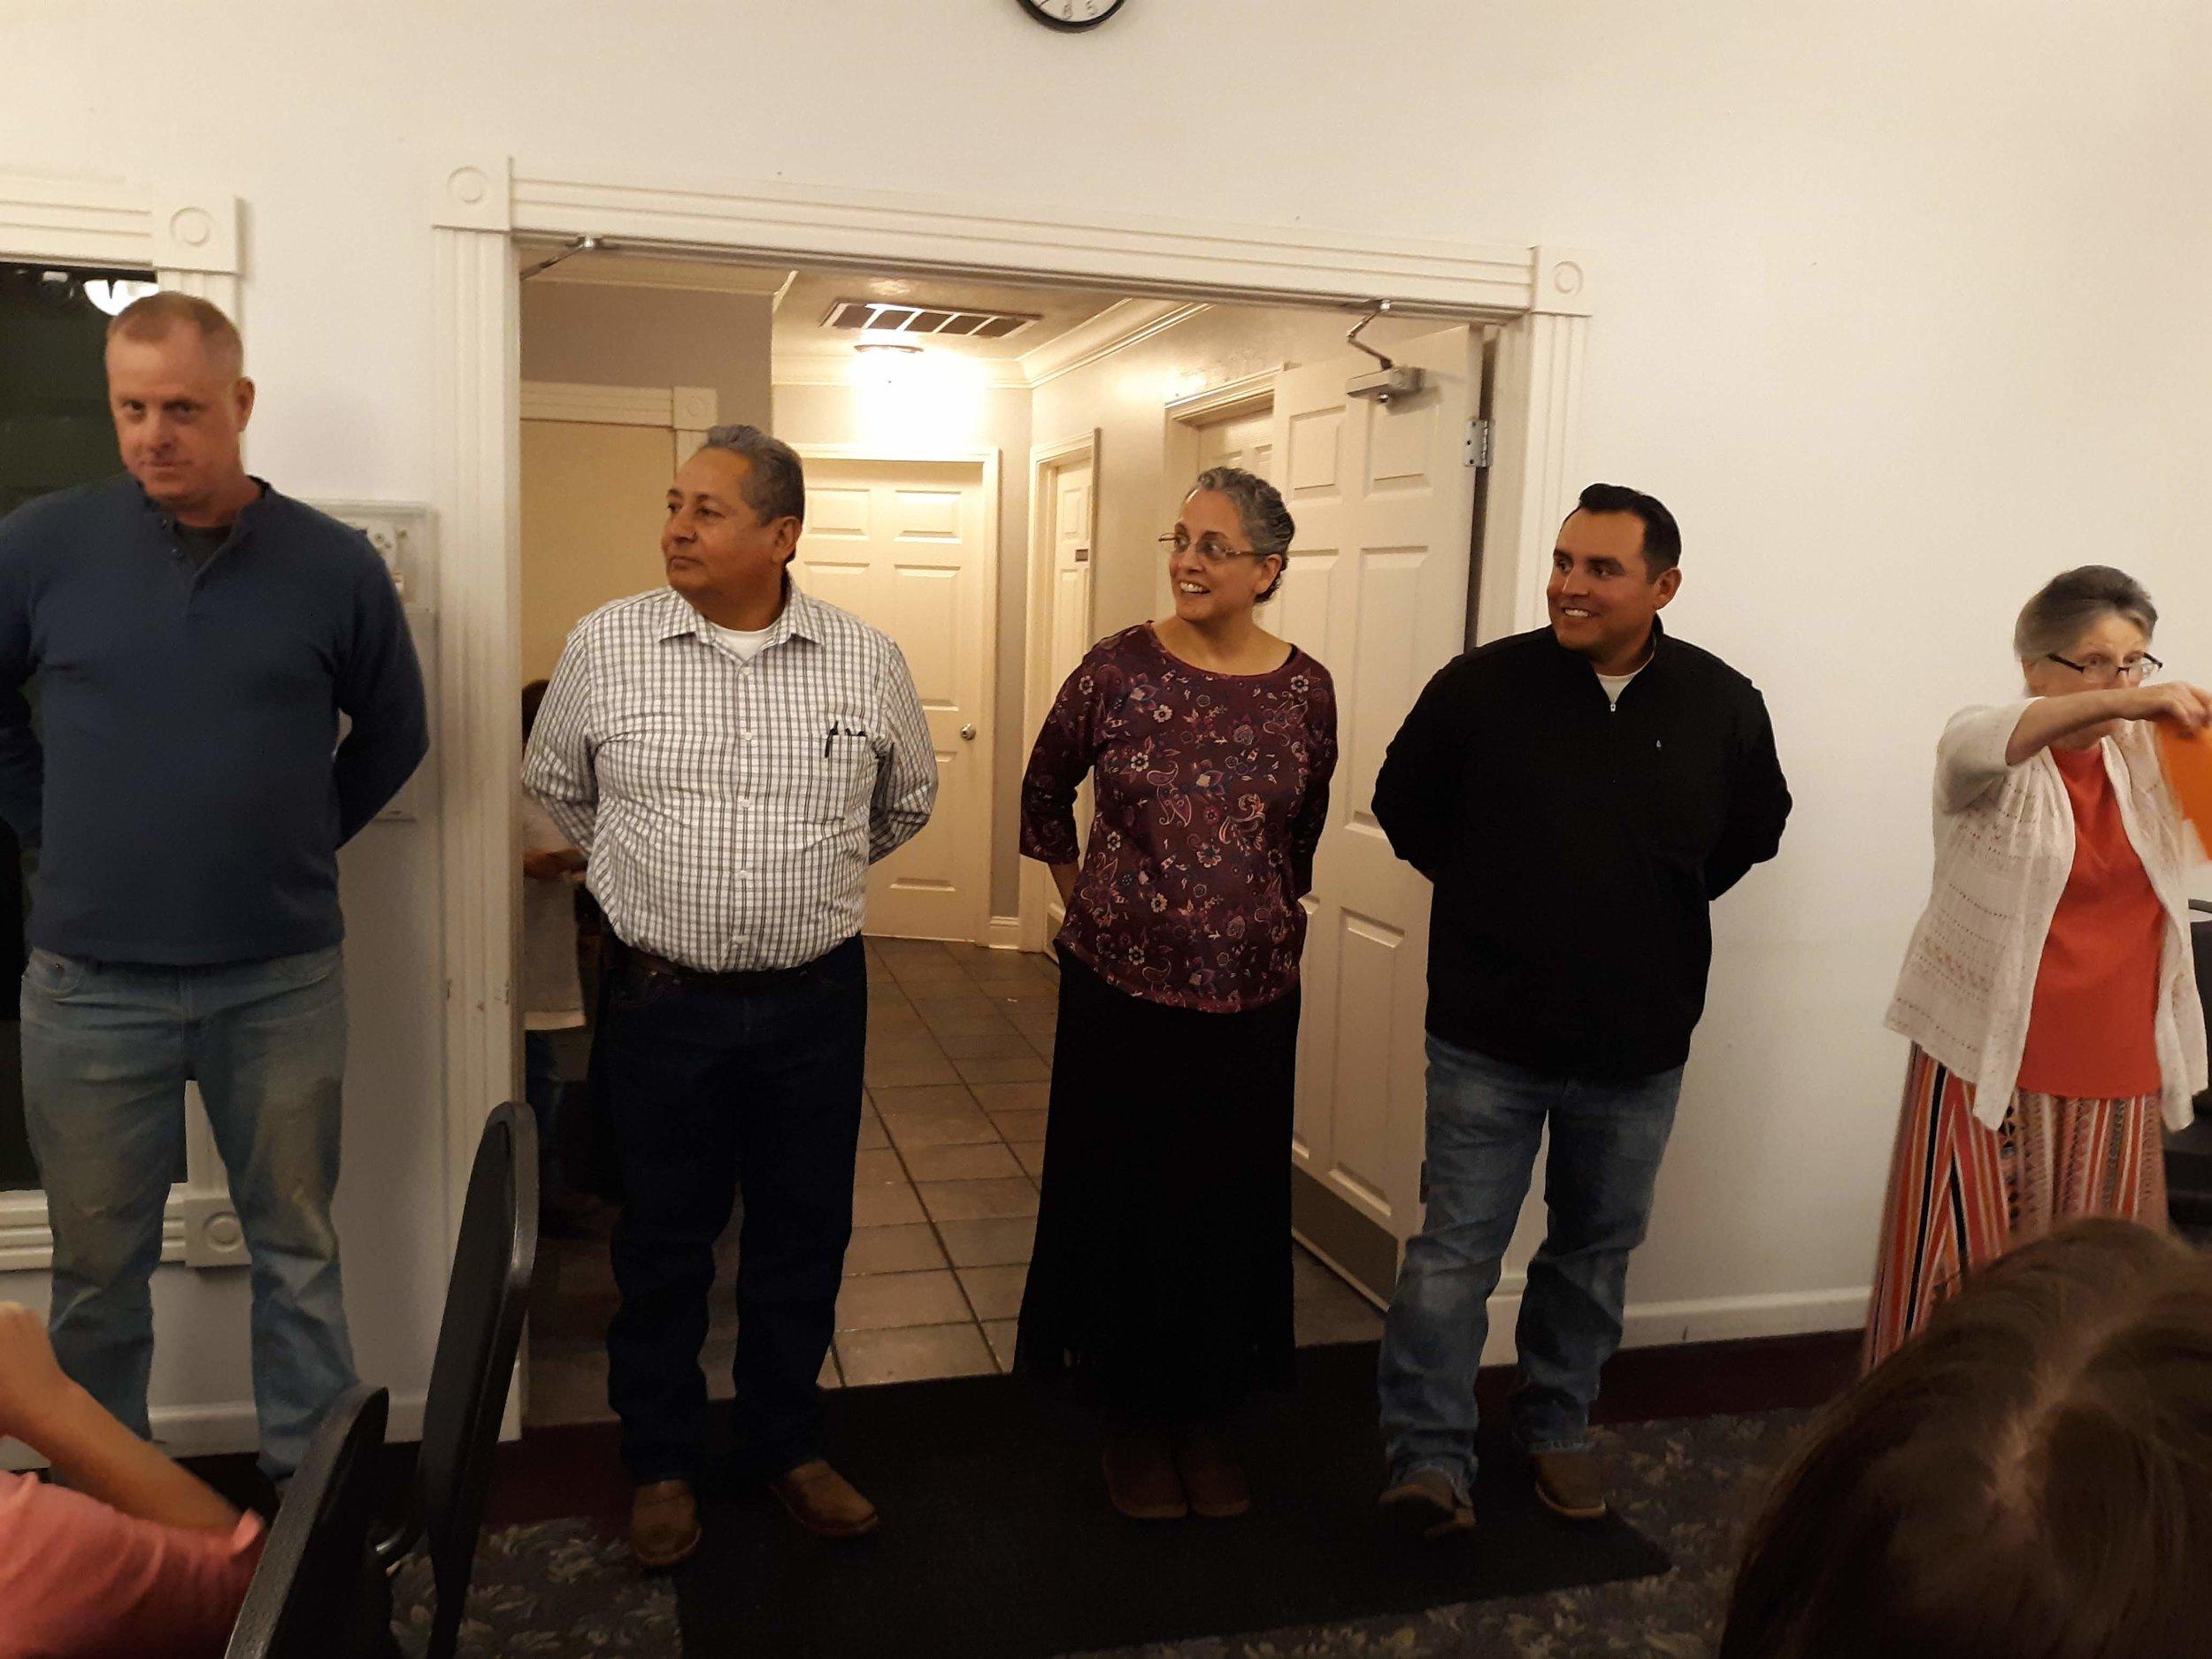 Mike, Bro. Nevarez, Sis. Loretta, Bro. Raul and Sis. Cynthia